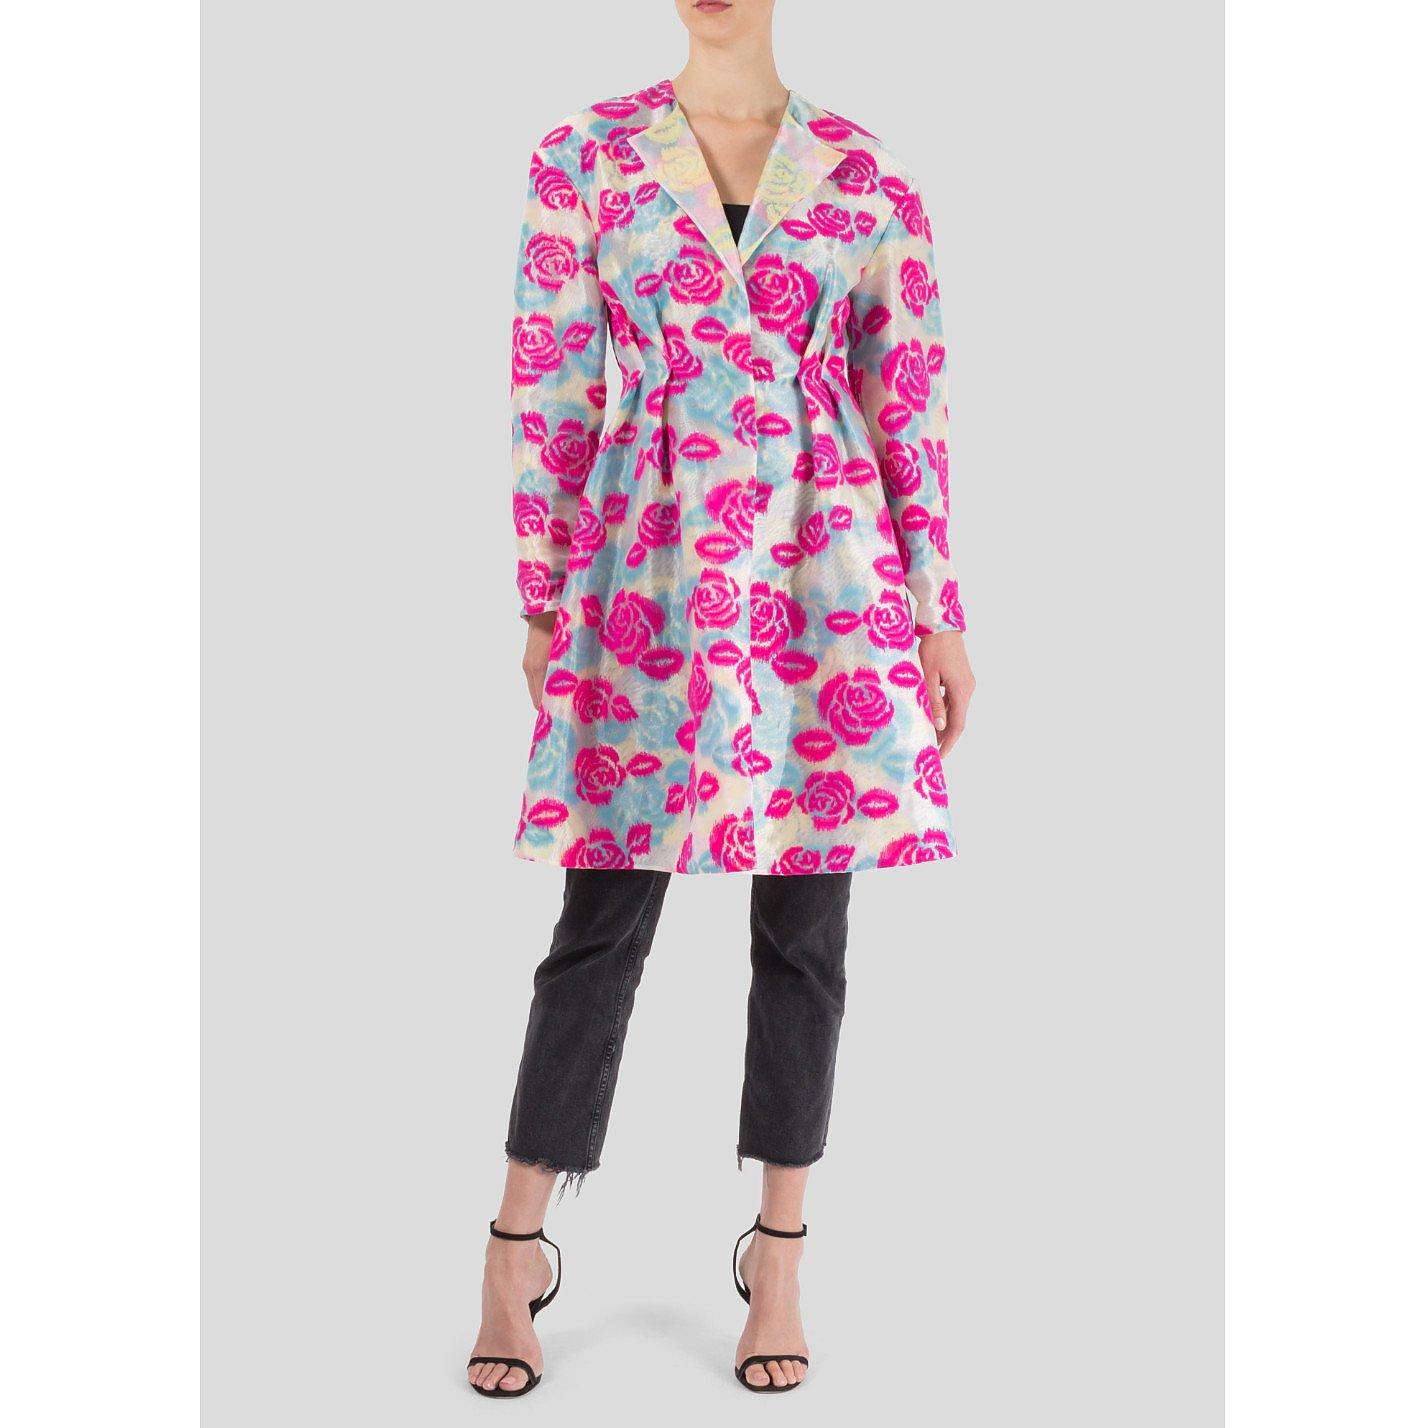 Starsica Floral Print Jacket